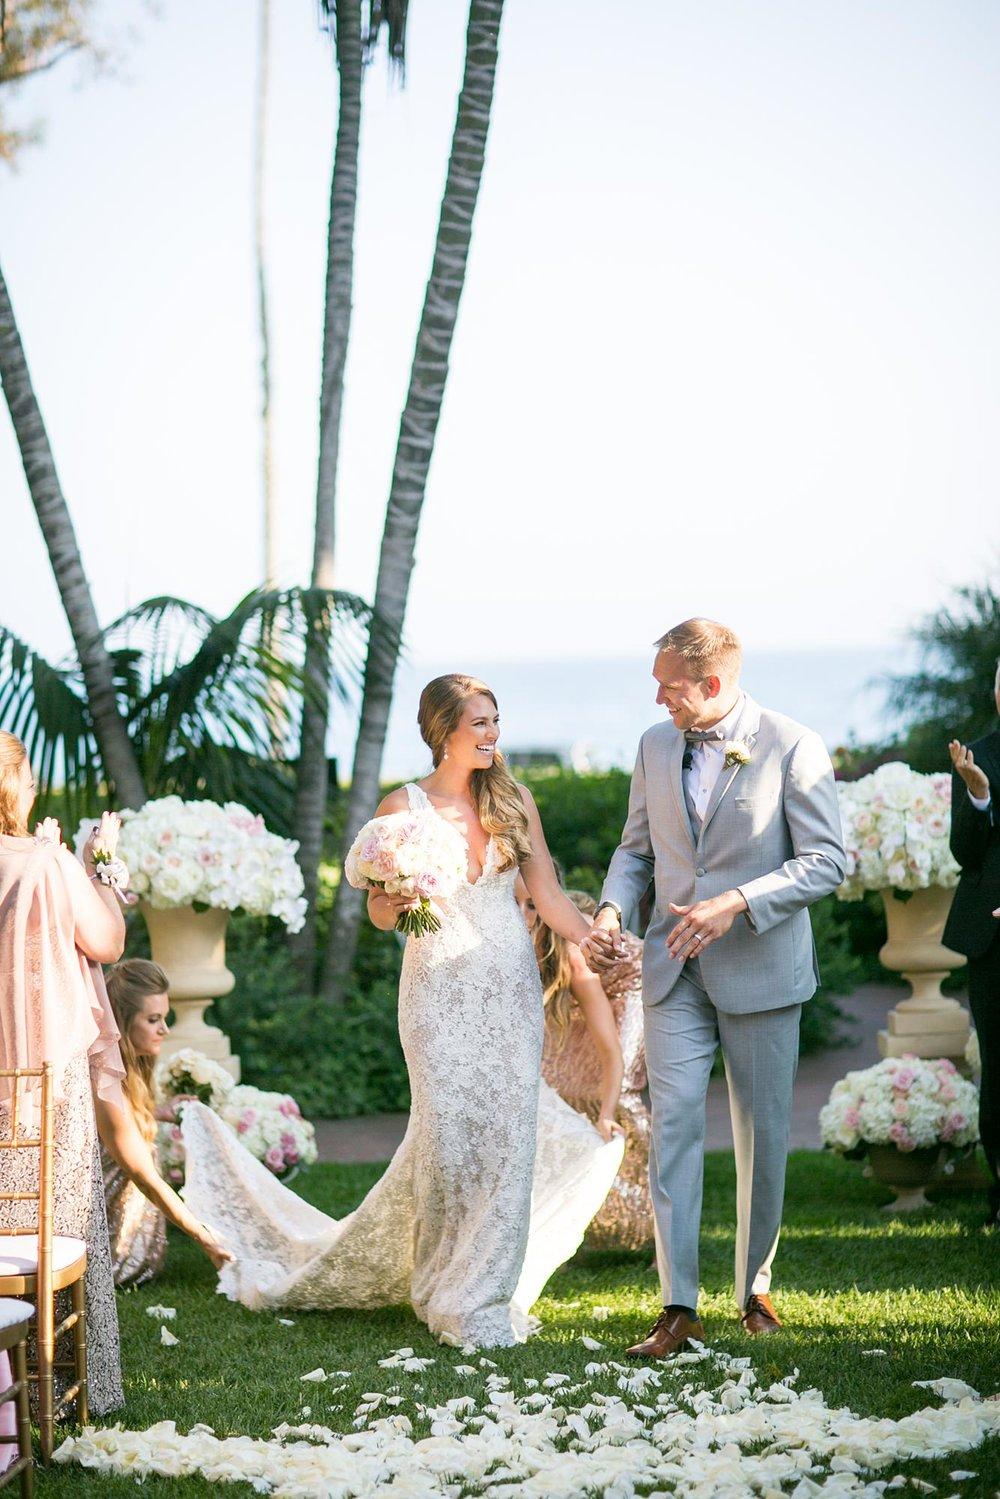 Four Seasons Biltmore Wedding | Miki & Sonja Photography | mikiandsonja.com